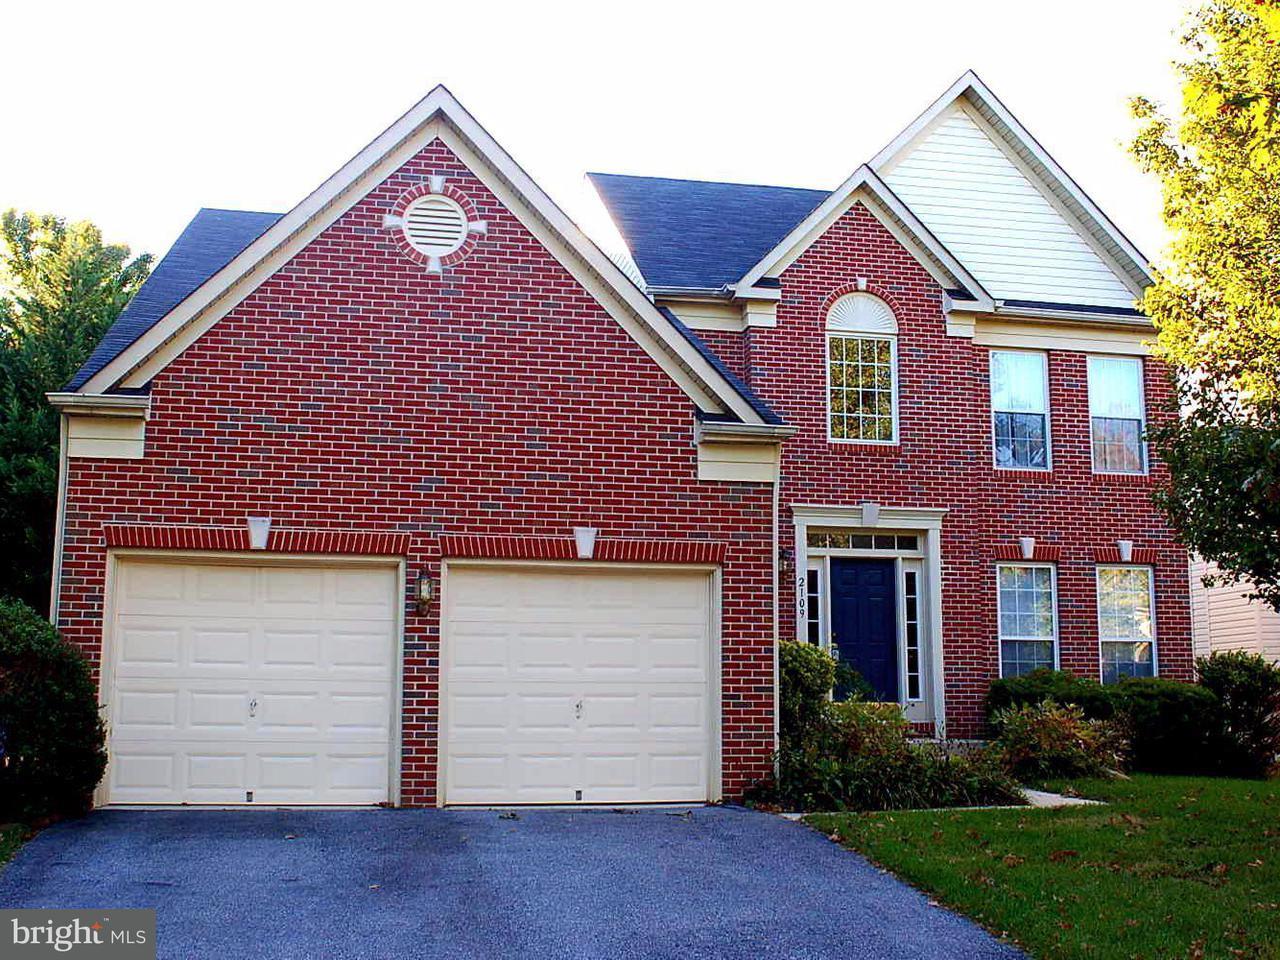 Villa per Vendita alle ore 2109 ABBOTT WAY 2109 ABBOTT WAY Woodstock, Maryland 21163 Stati Uniti